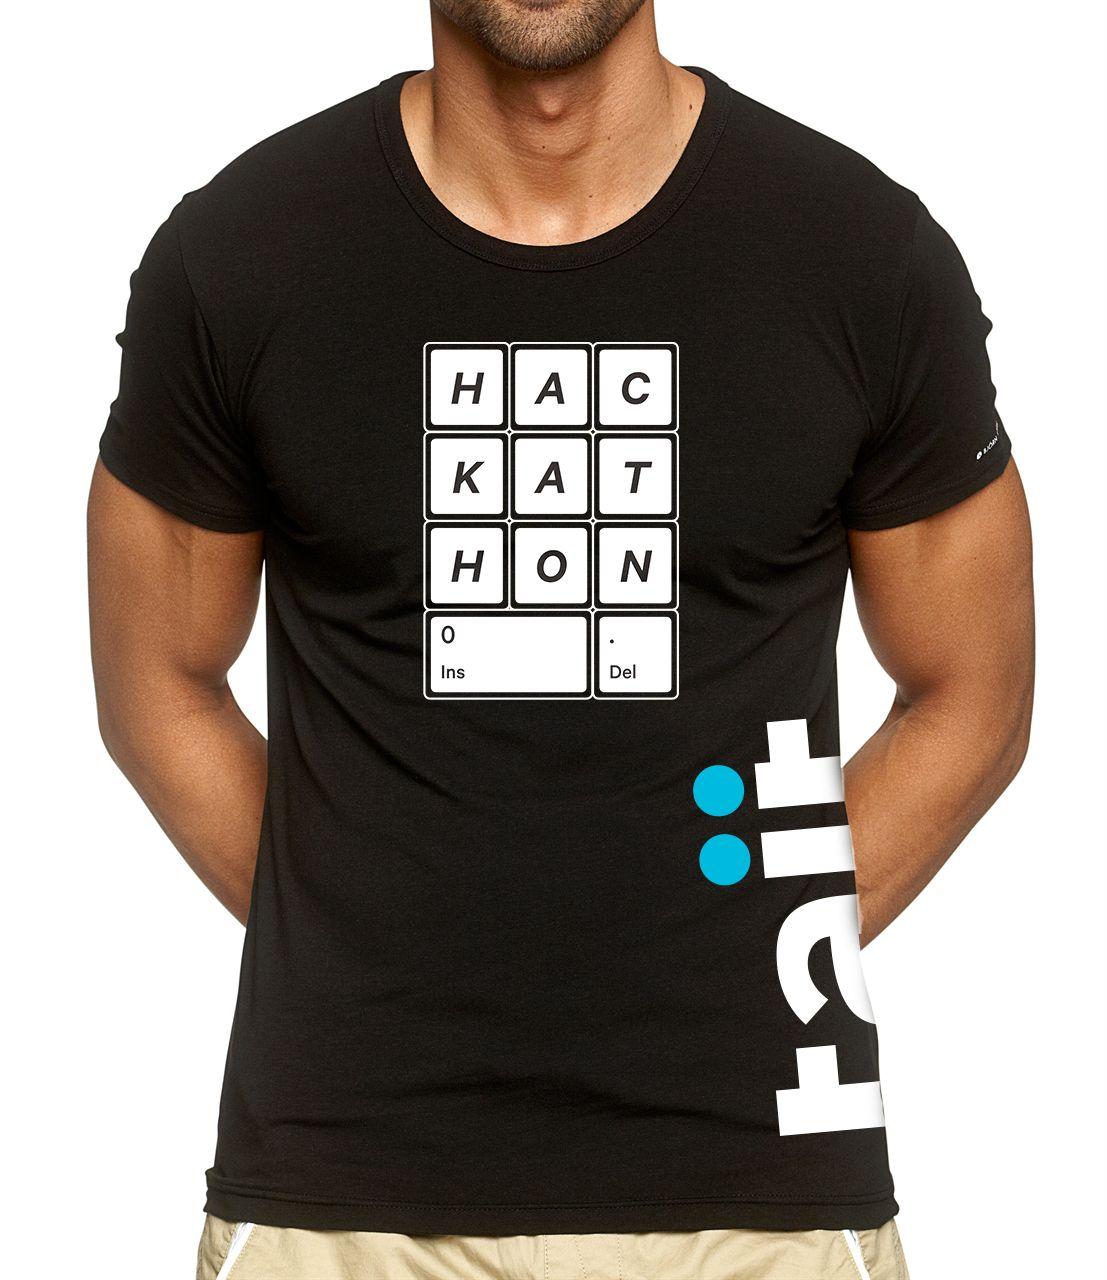 T shirt design queenstown - The New Hackathon Logo Sponsored By Tait Communications T Shirt Design Was